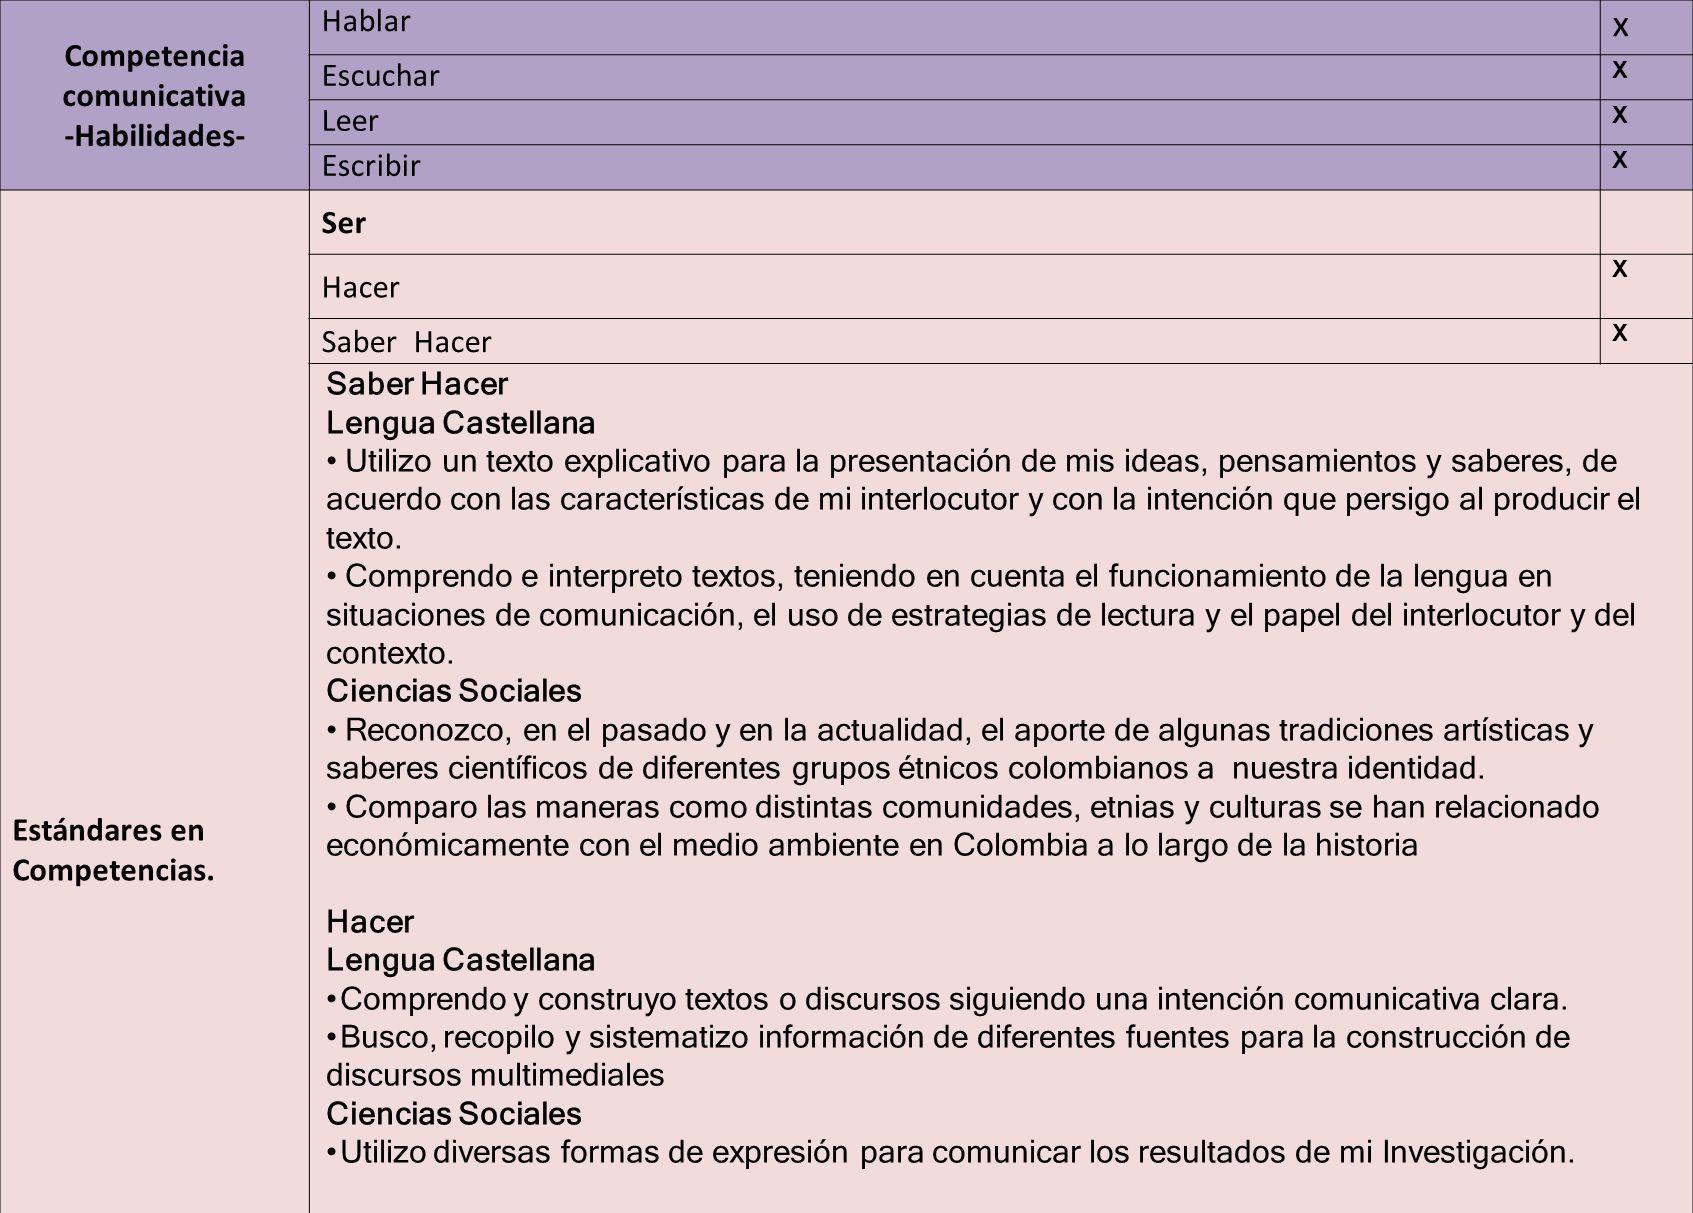 Competencia comunicativa -Habilidades- Hablar x Escuchar X Leer X Escribir X Estándares en Competencias. Ser Hacer X Saber Hacer X Lengua Castellana U